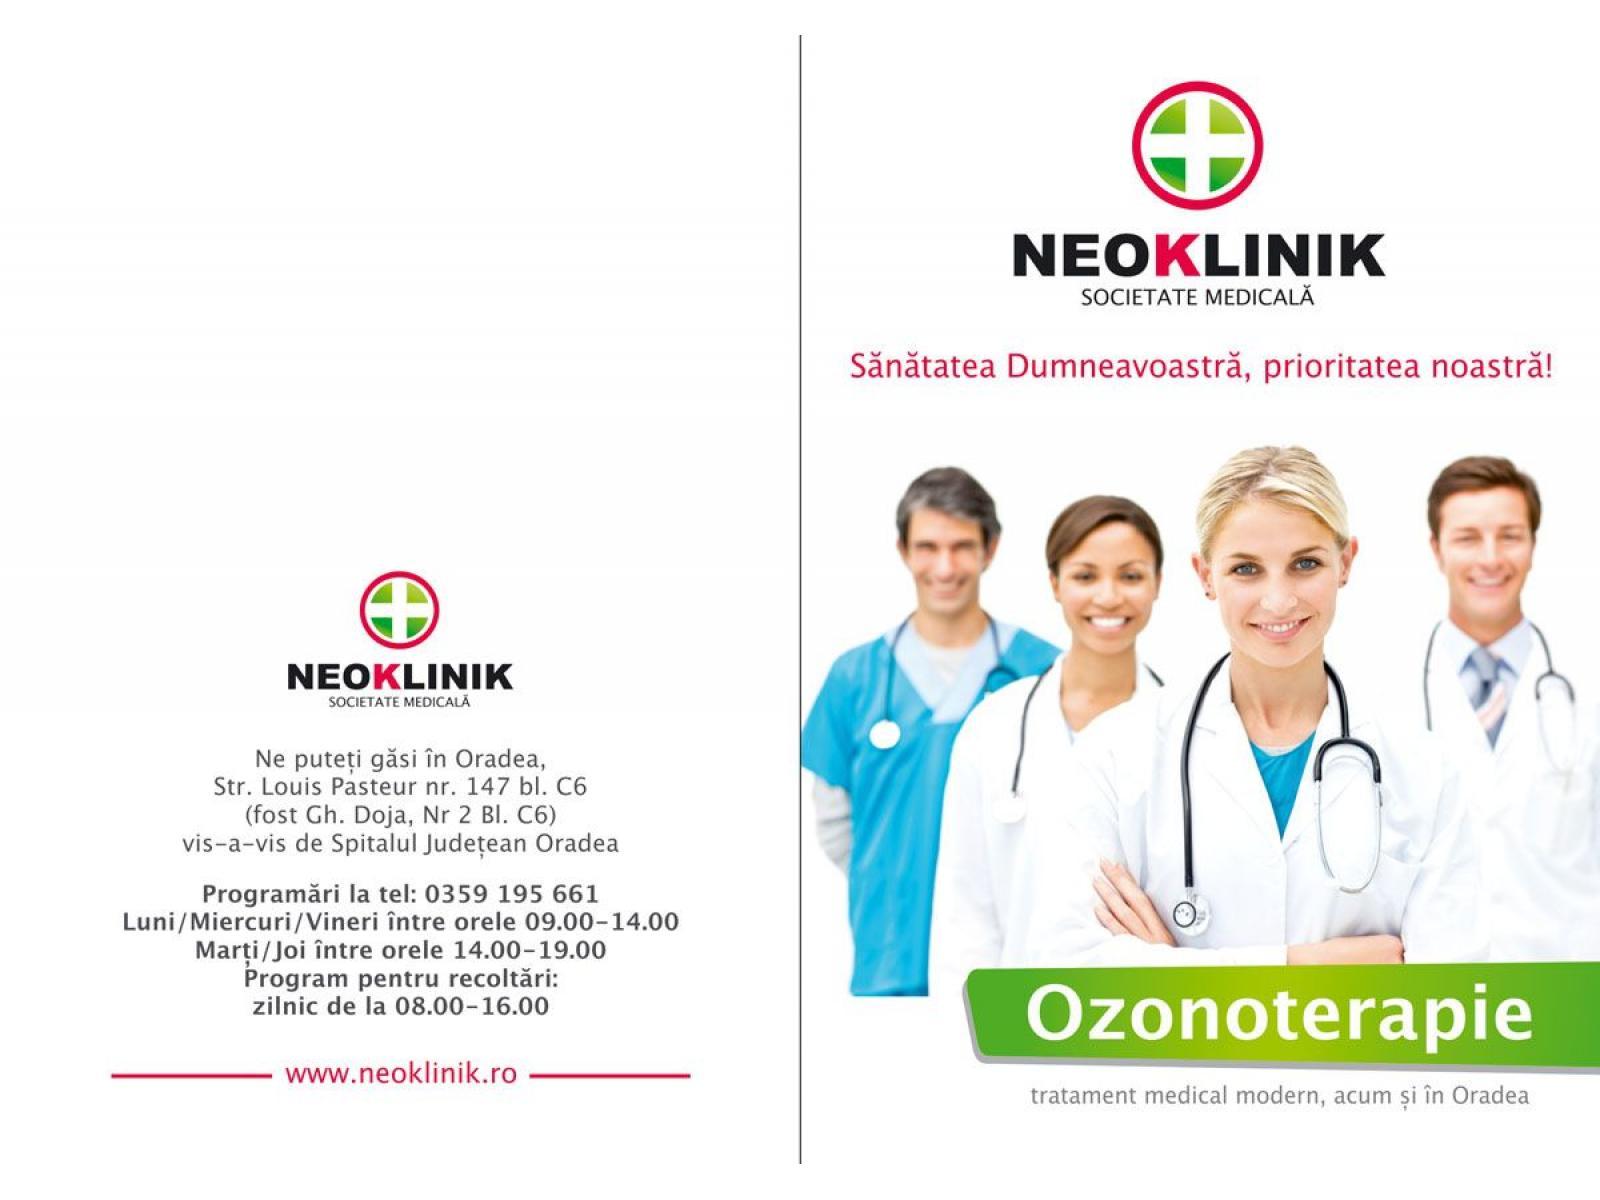 NeoKlinik - FLUTURAS_NEOKLINIK_A5_coperta.jpg